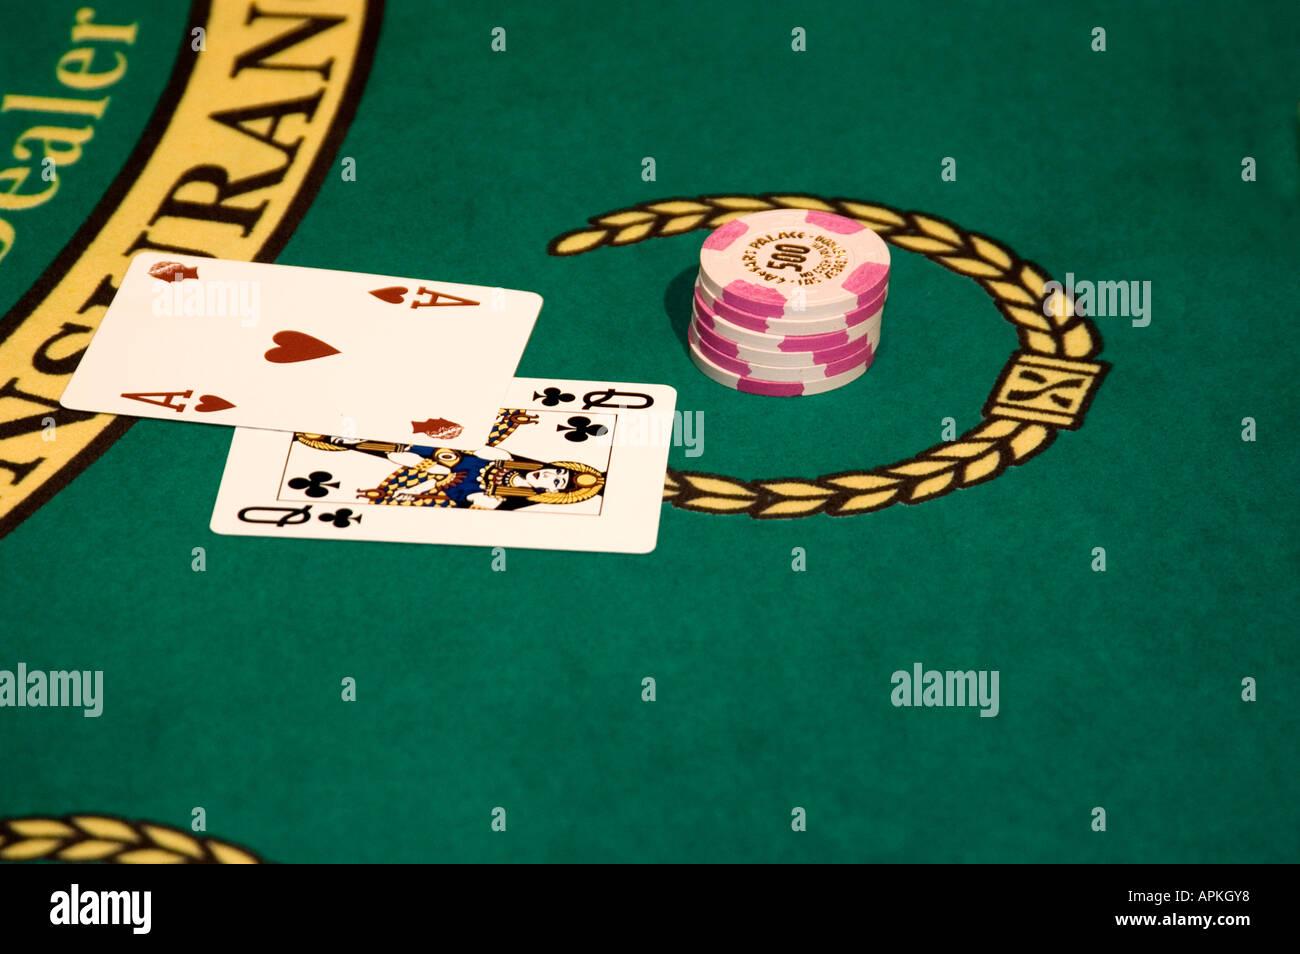 Blackjack hand in Las Vegas Nevada Caesars Palace and Casino - Stock Image